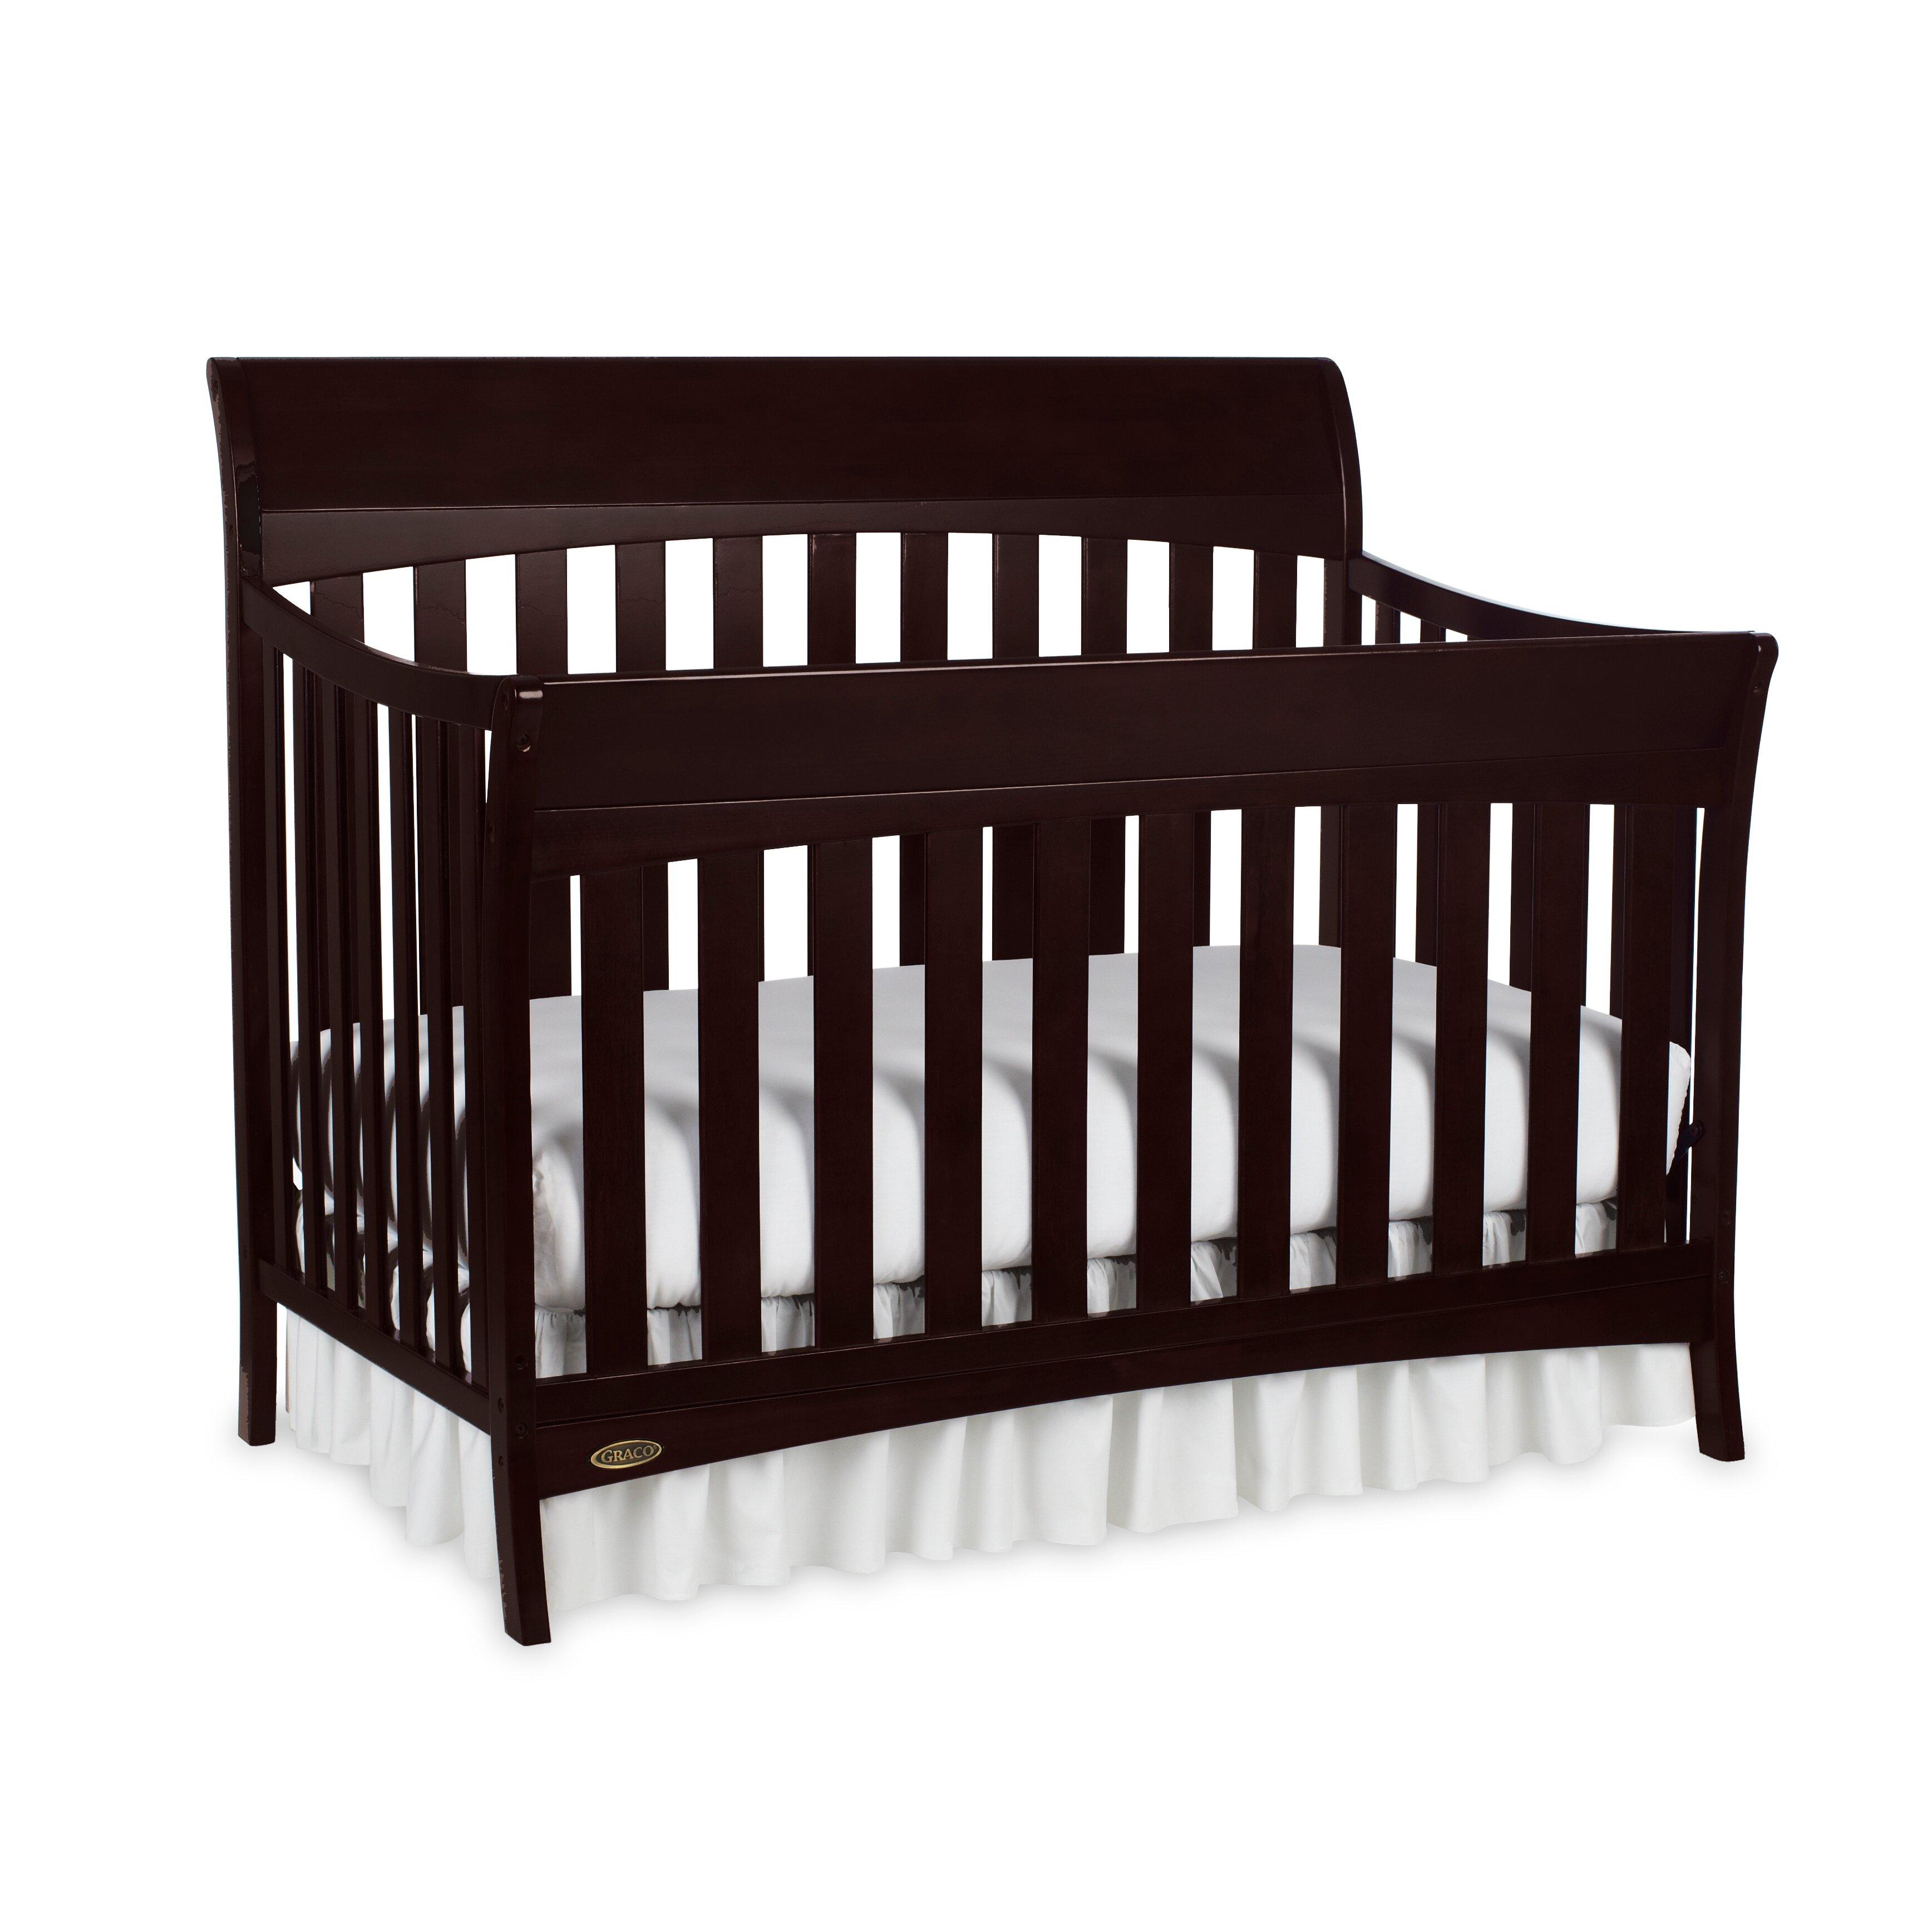 Graco crib for sale manila - Baby Cribs Graco Graco Rory 4 In 1 Convertible Crib